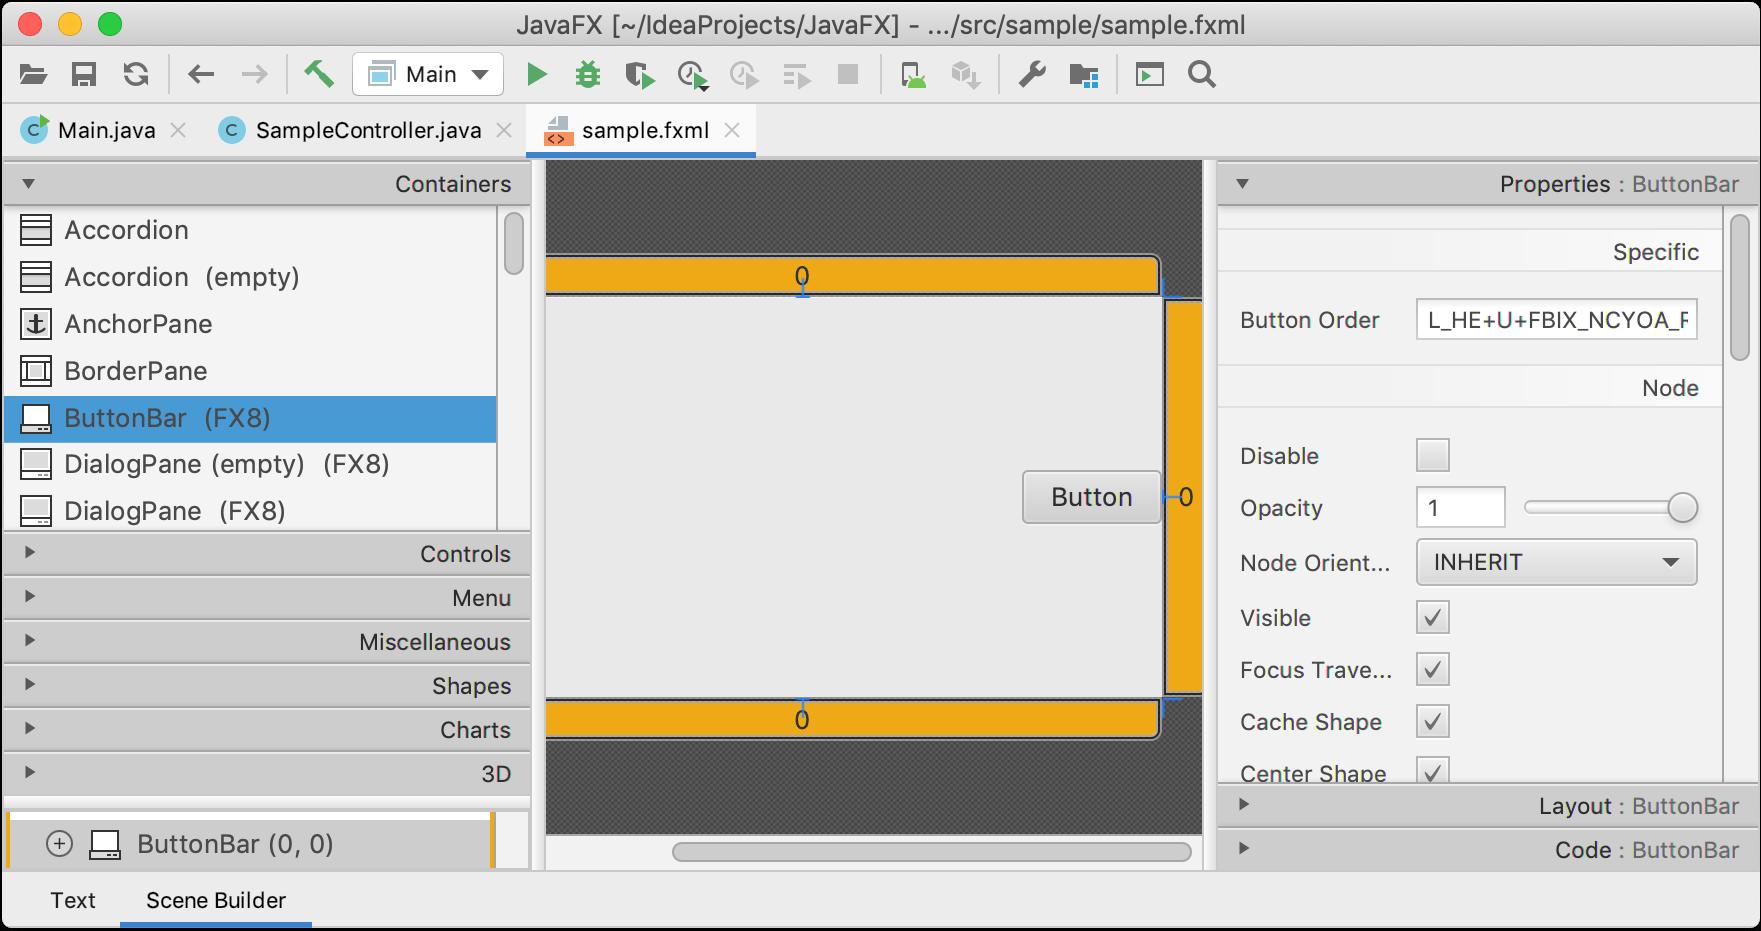 An .fxml file opened in Scene Builder in the IDE